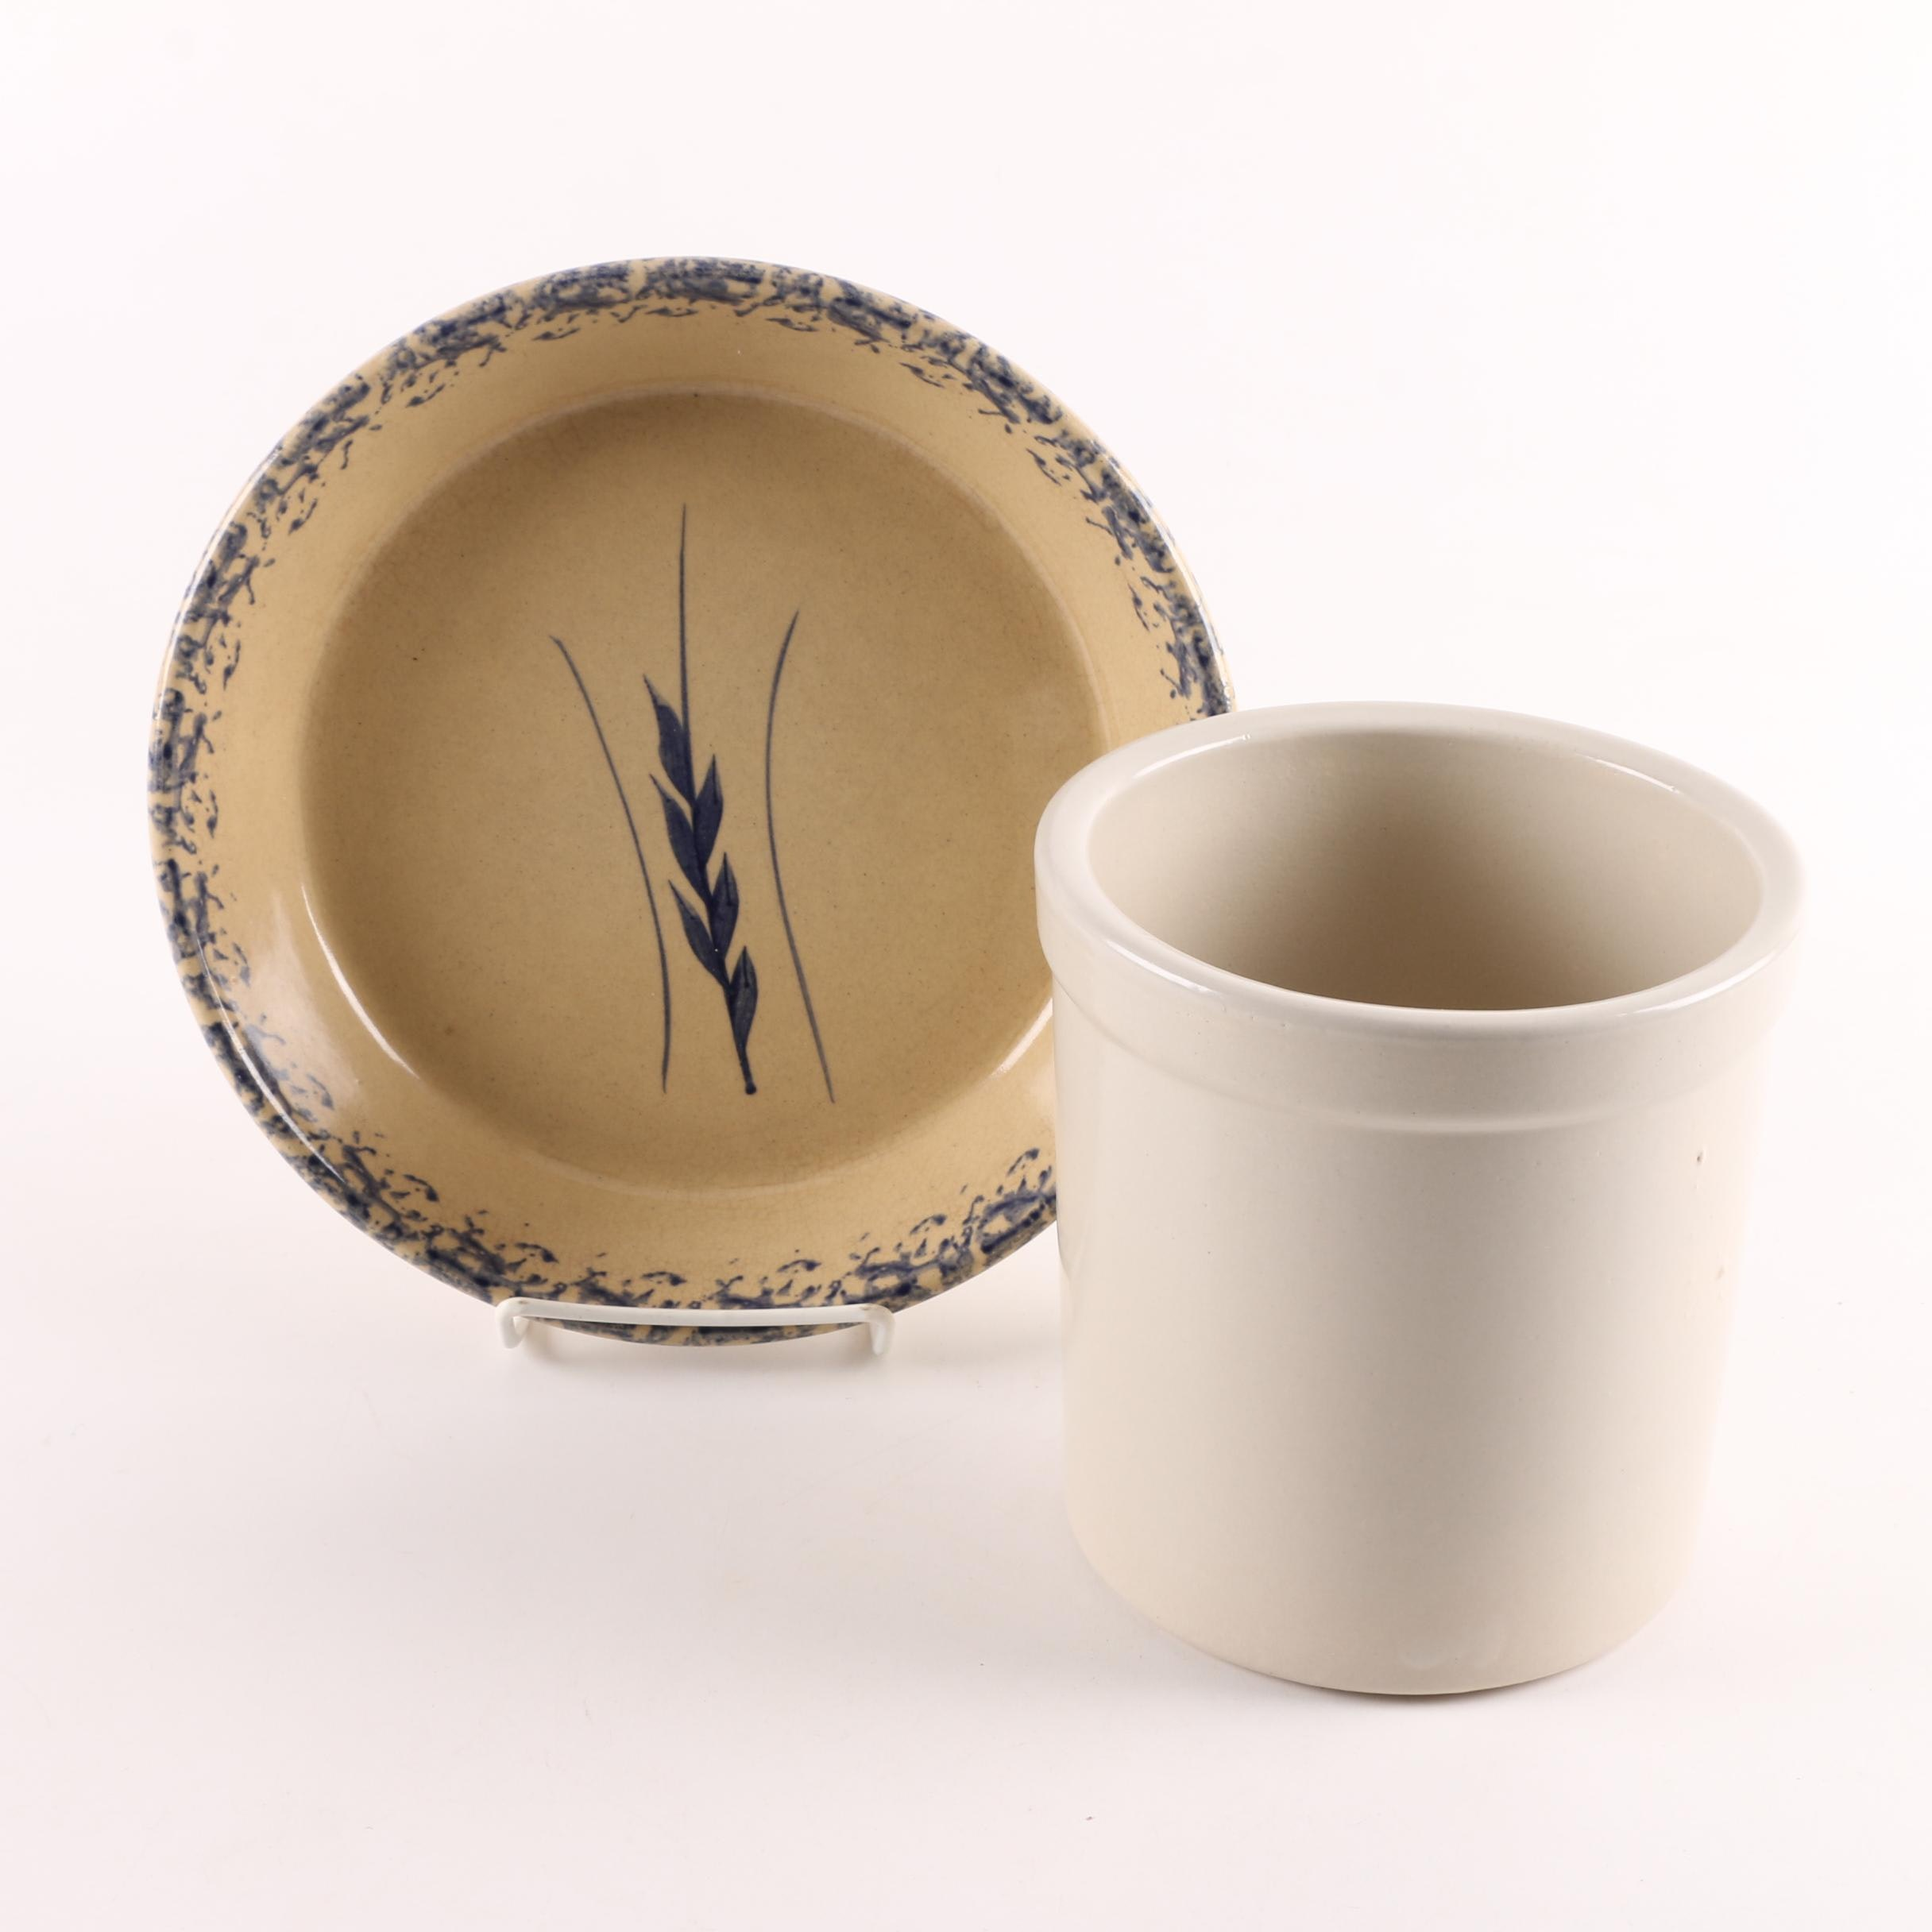 Robinson-Ransbottom Pie Plate and Stoneware Crock ... & Robinson-Ransbottom Pie Plate and Stoneware Crock : EBTH